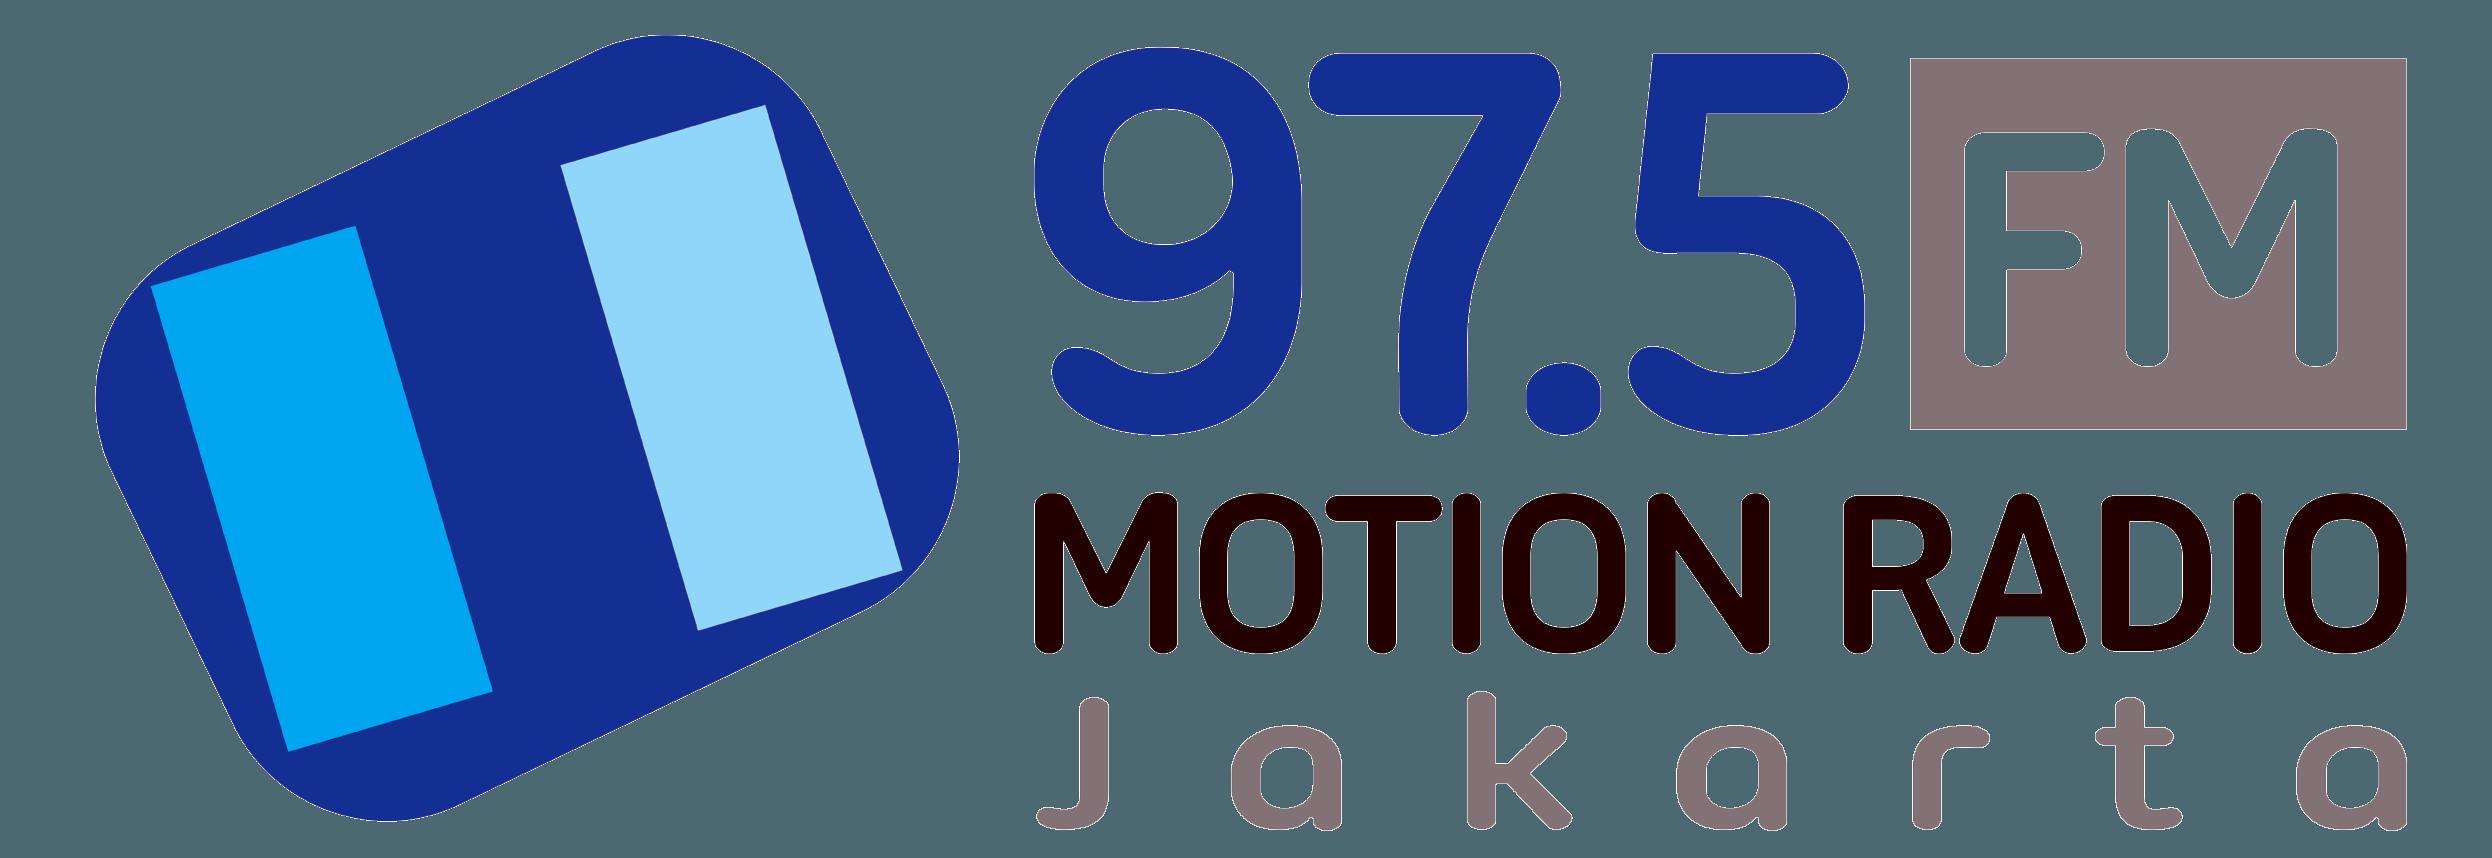 Motion Radio 97.5 Live